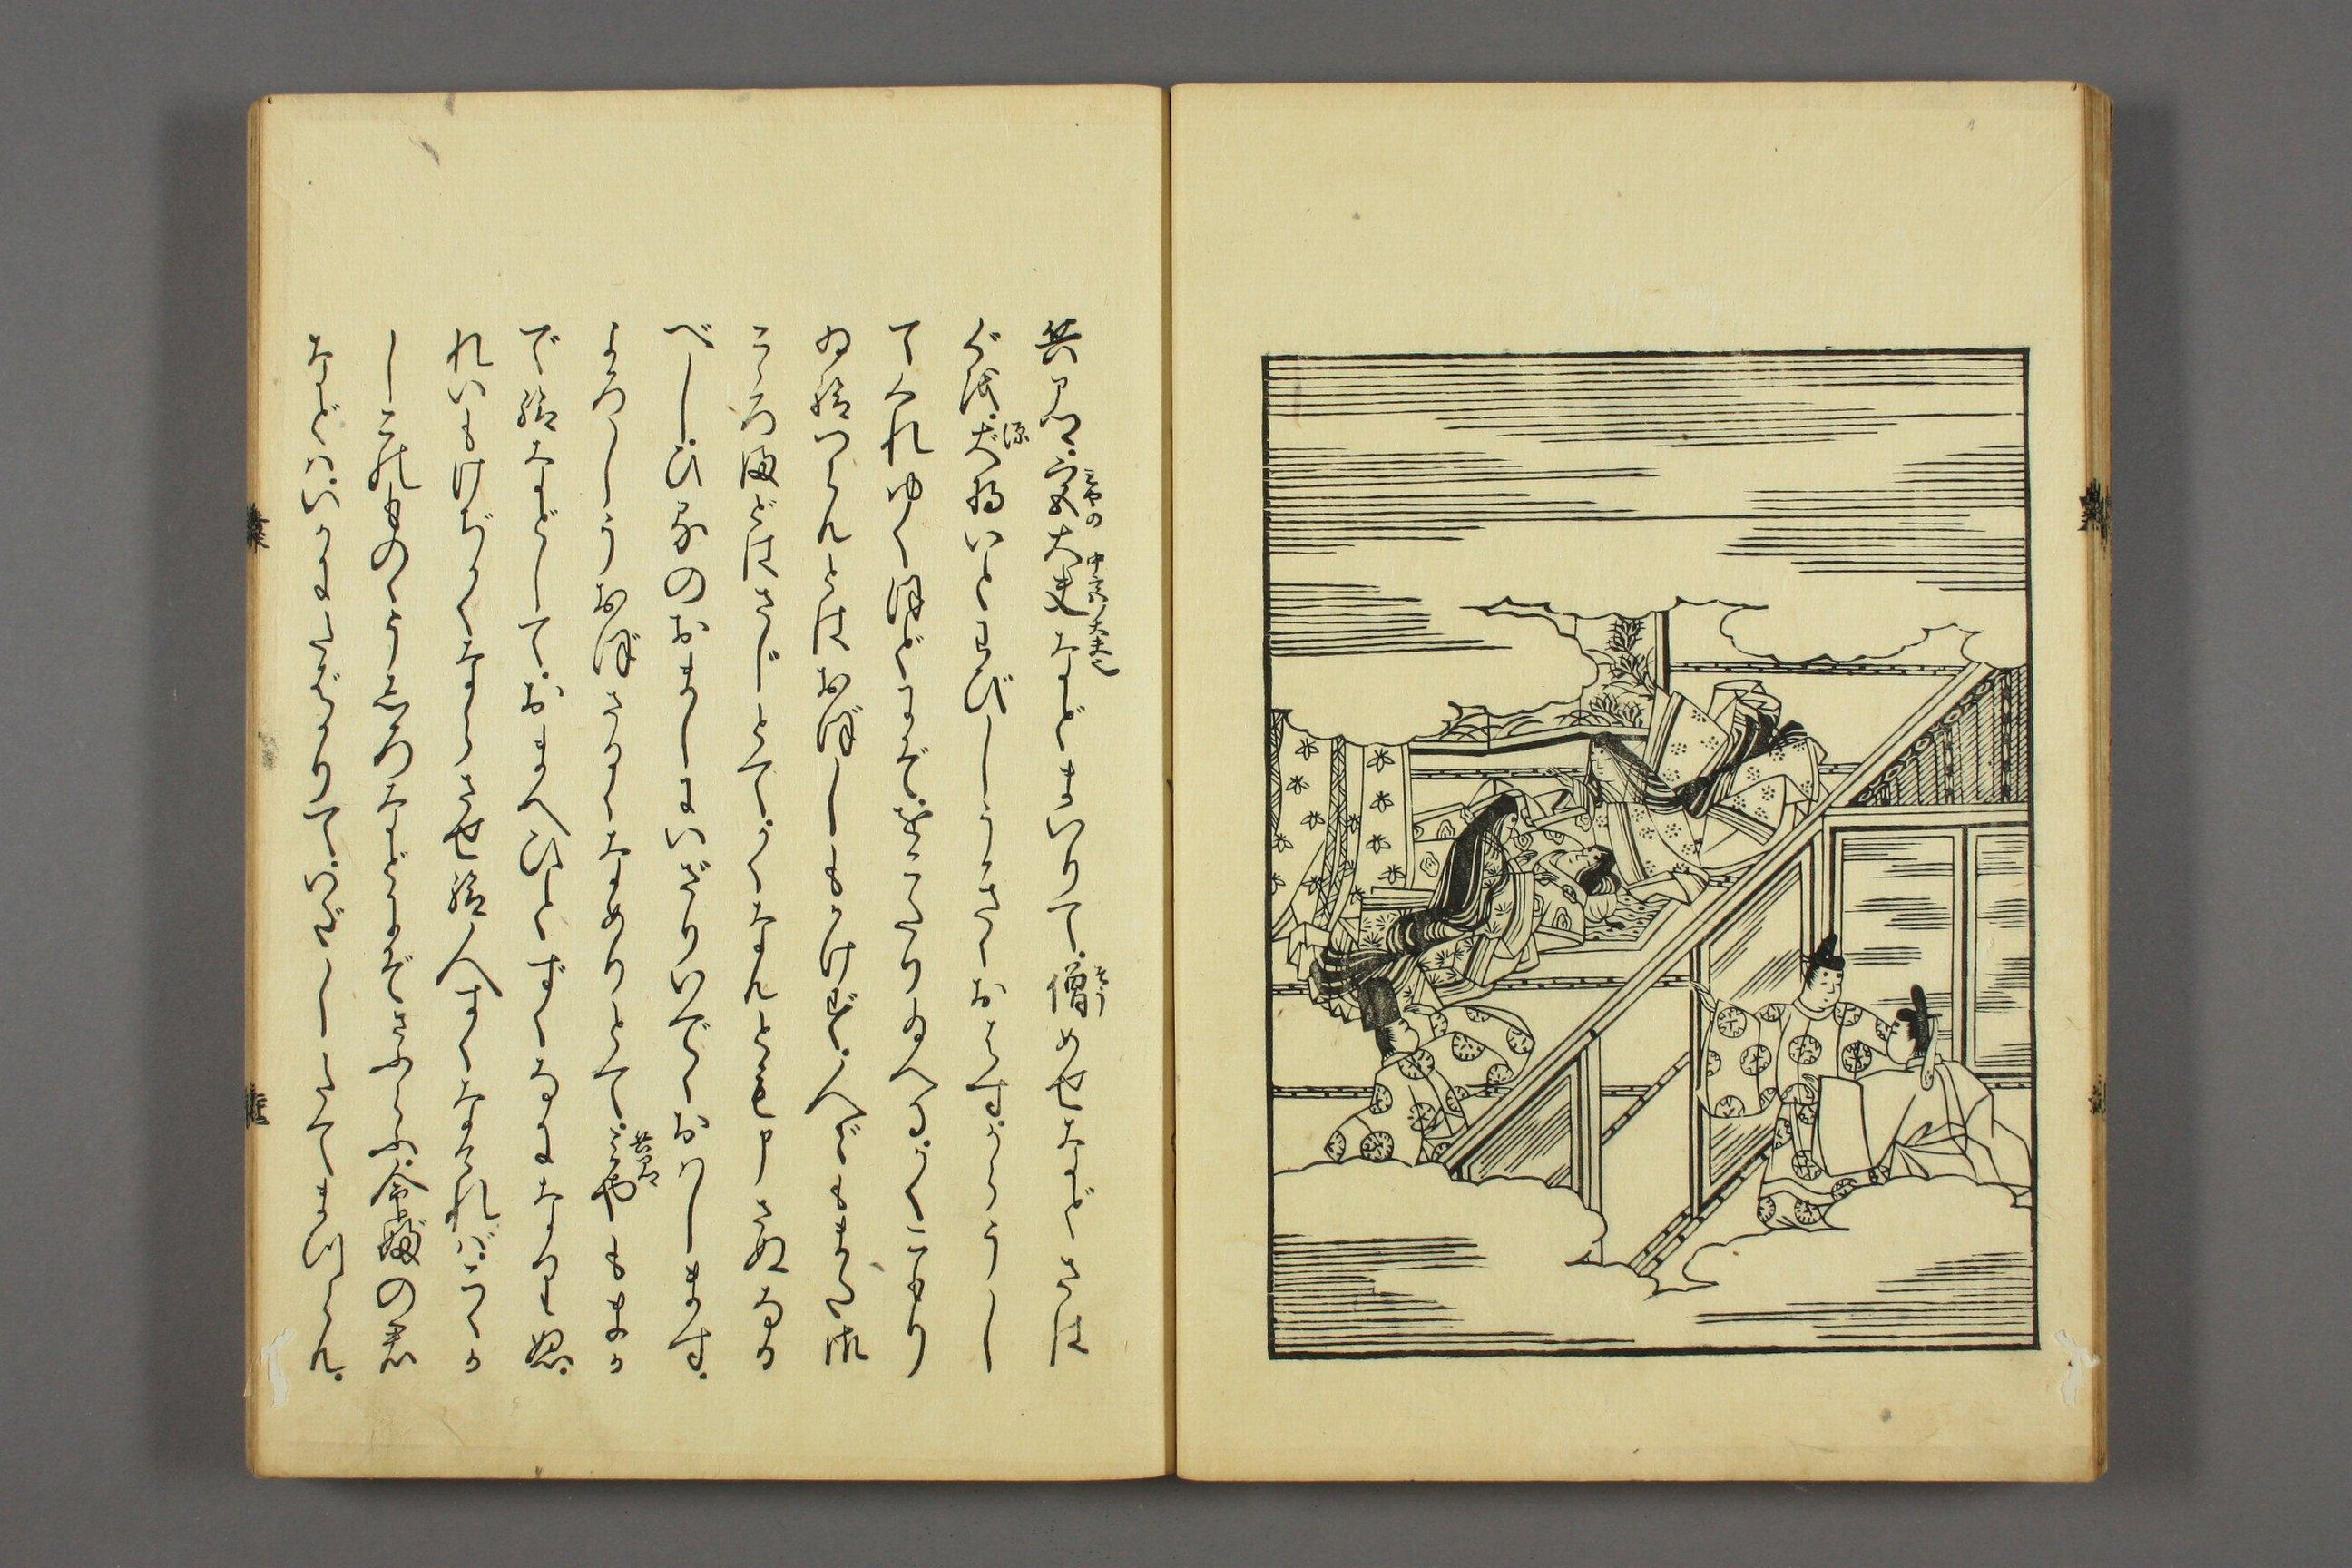 http://archive.wul.waseda.ac.jp/kosho/bunko30/bunko30_a0007/bunko30_a0007_0010/bunko30_a0007_0010_p0023.jpg